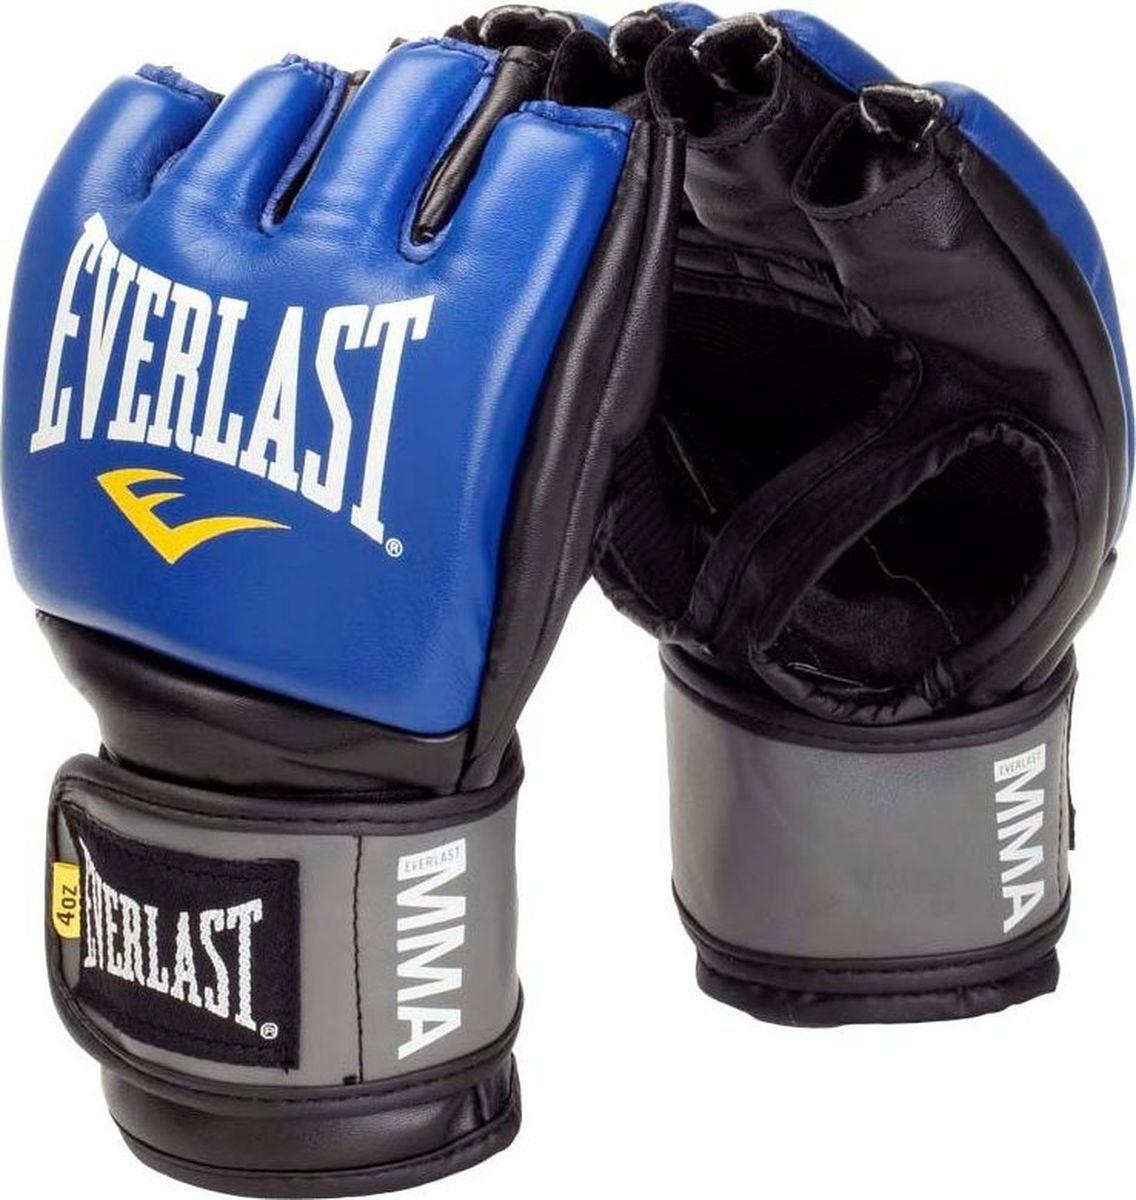 Перчатки для единоборств Everlast Pro Style Grappling, тренировочные, 7778RBLXLU, синий, размер L/XL цена